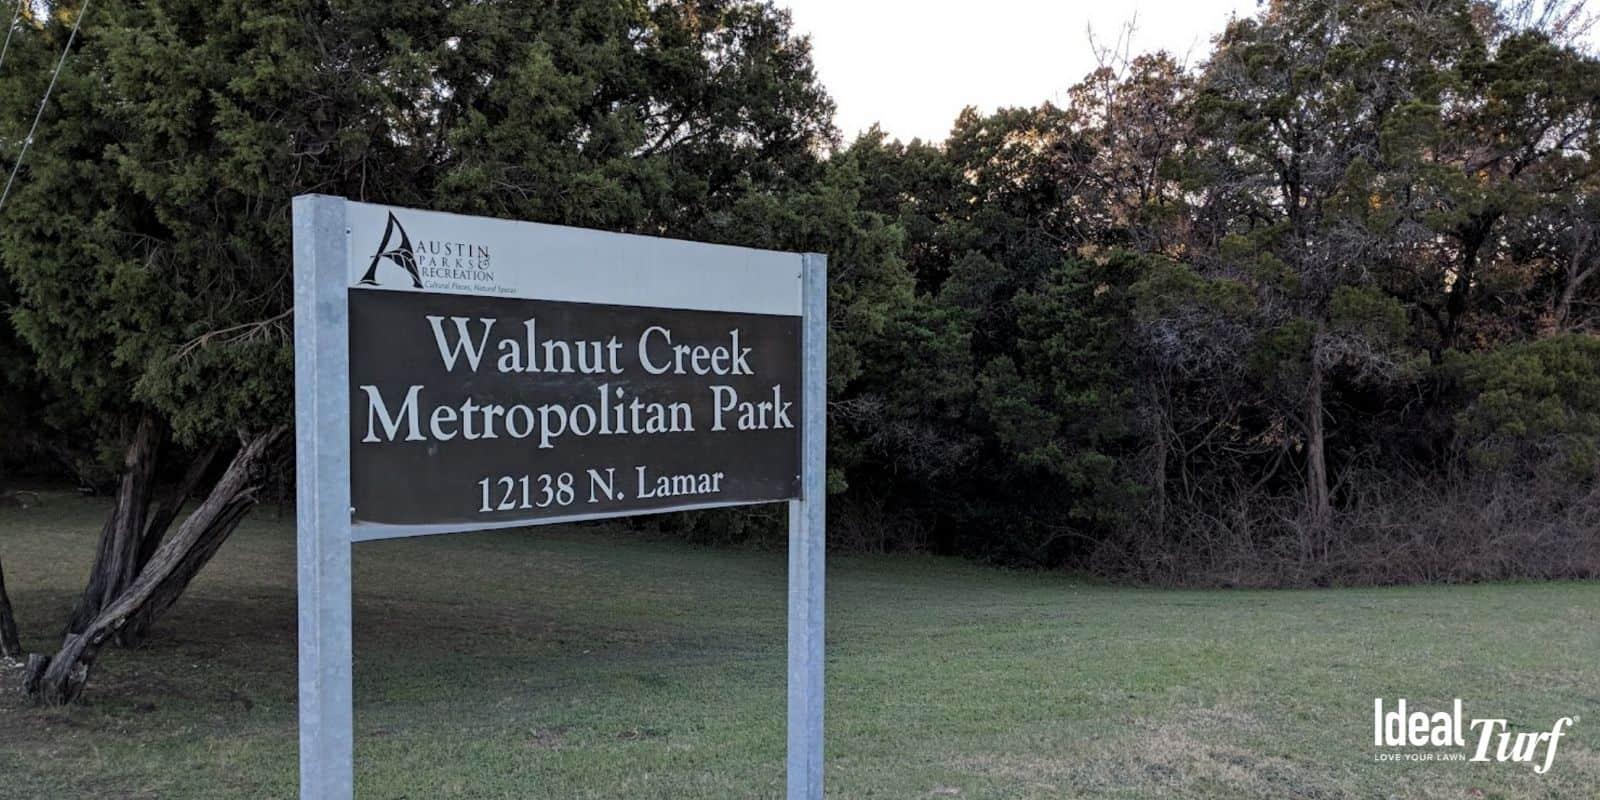 4. Walnut Creek Metropolitan Park Austin TX